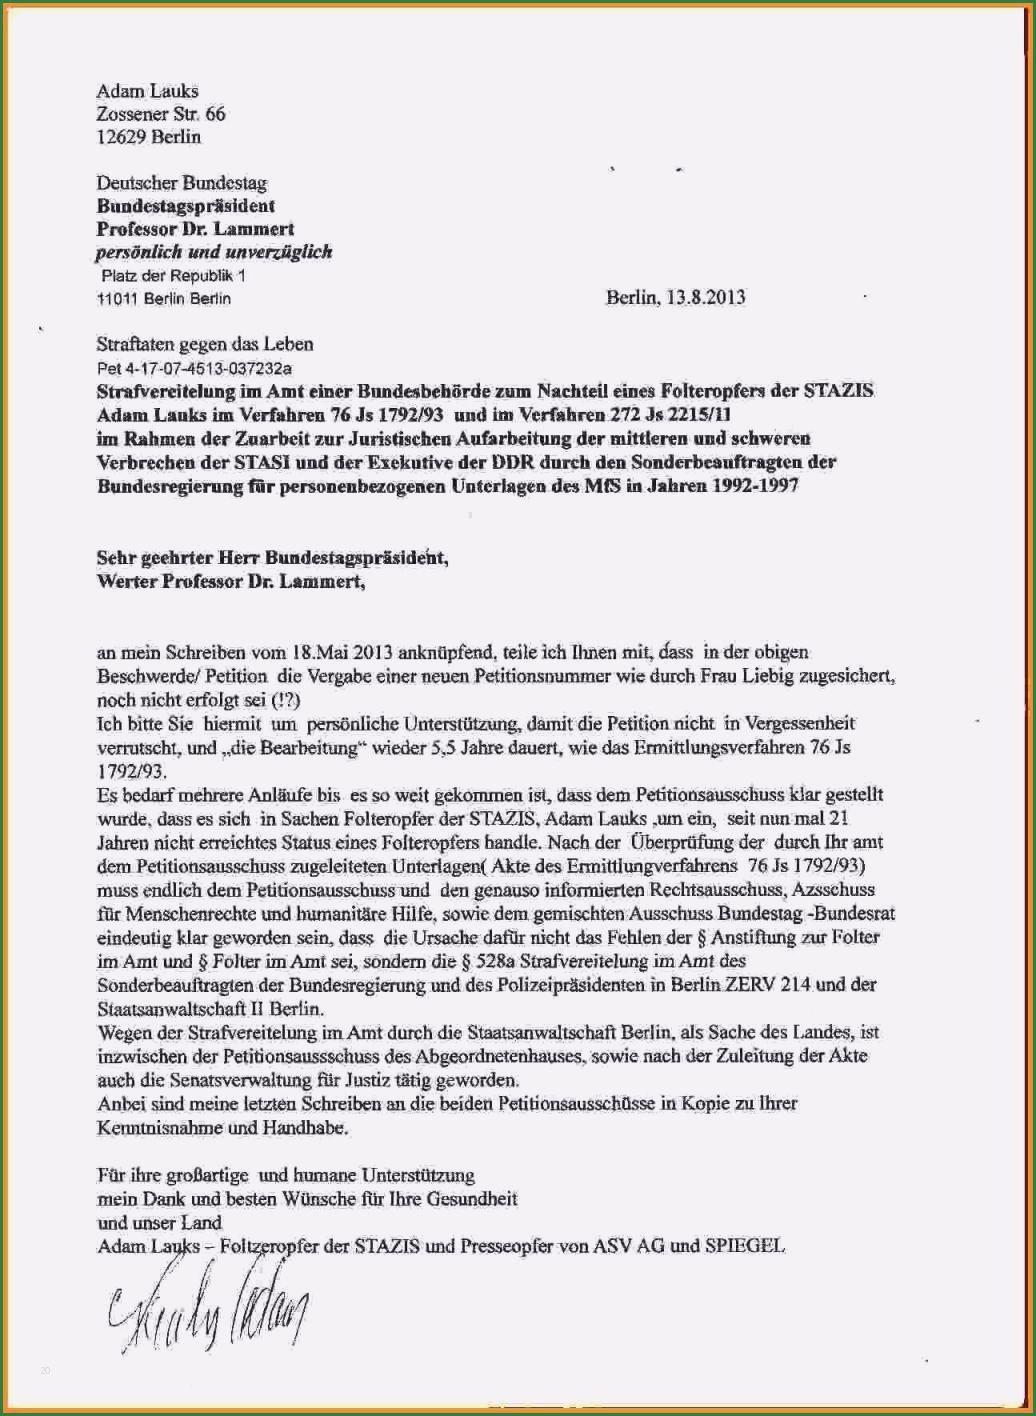 11 Fuhrender Lebenslauf Berichtsform Bundespolizei Vorlage In 2020 Lebenslauf Lebenslauf Muster Vorlagen Lebenslauf